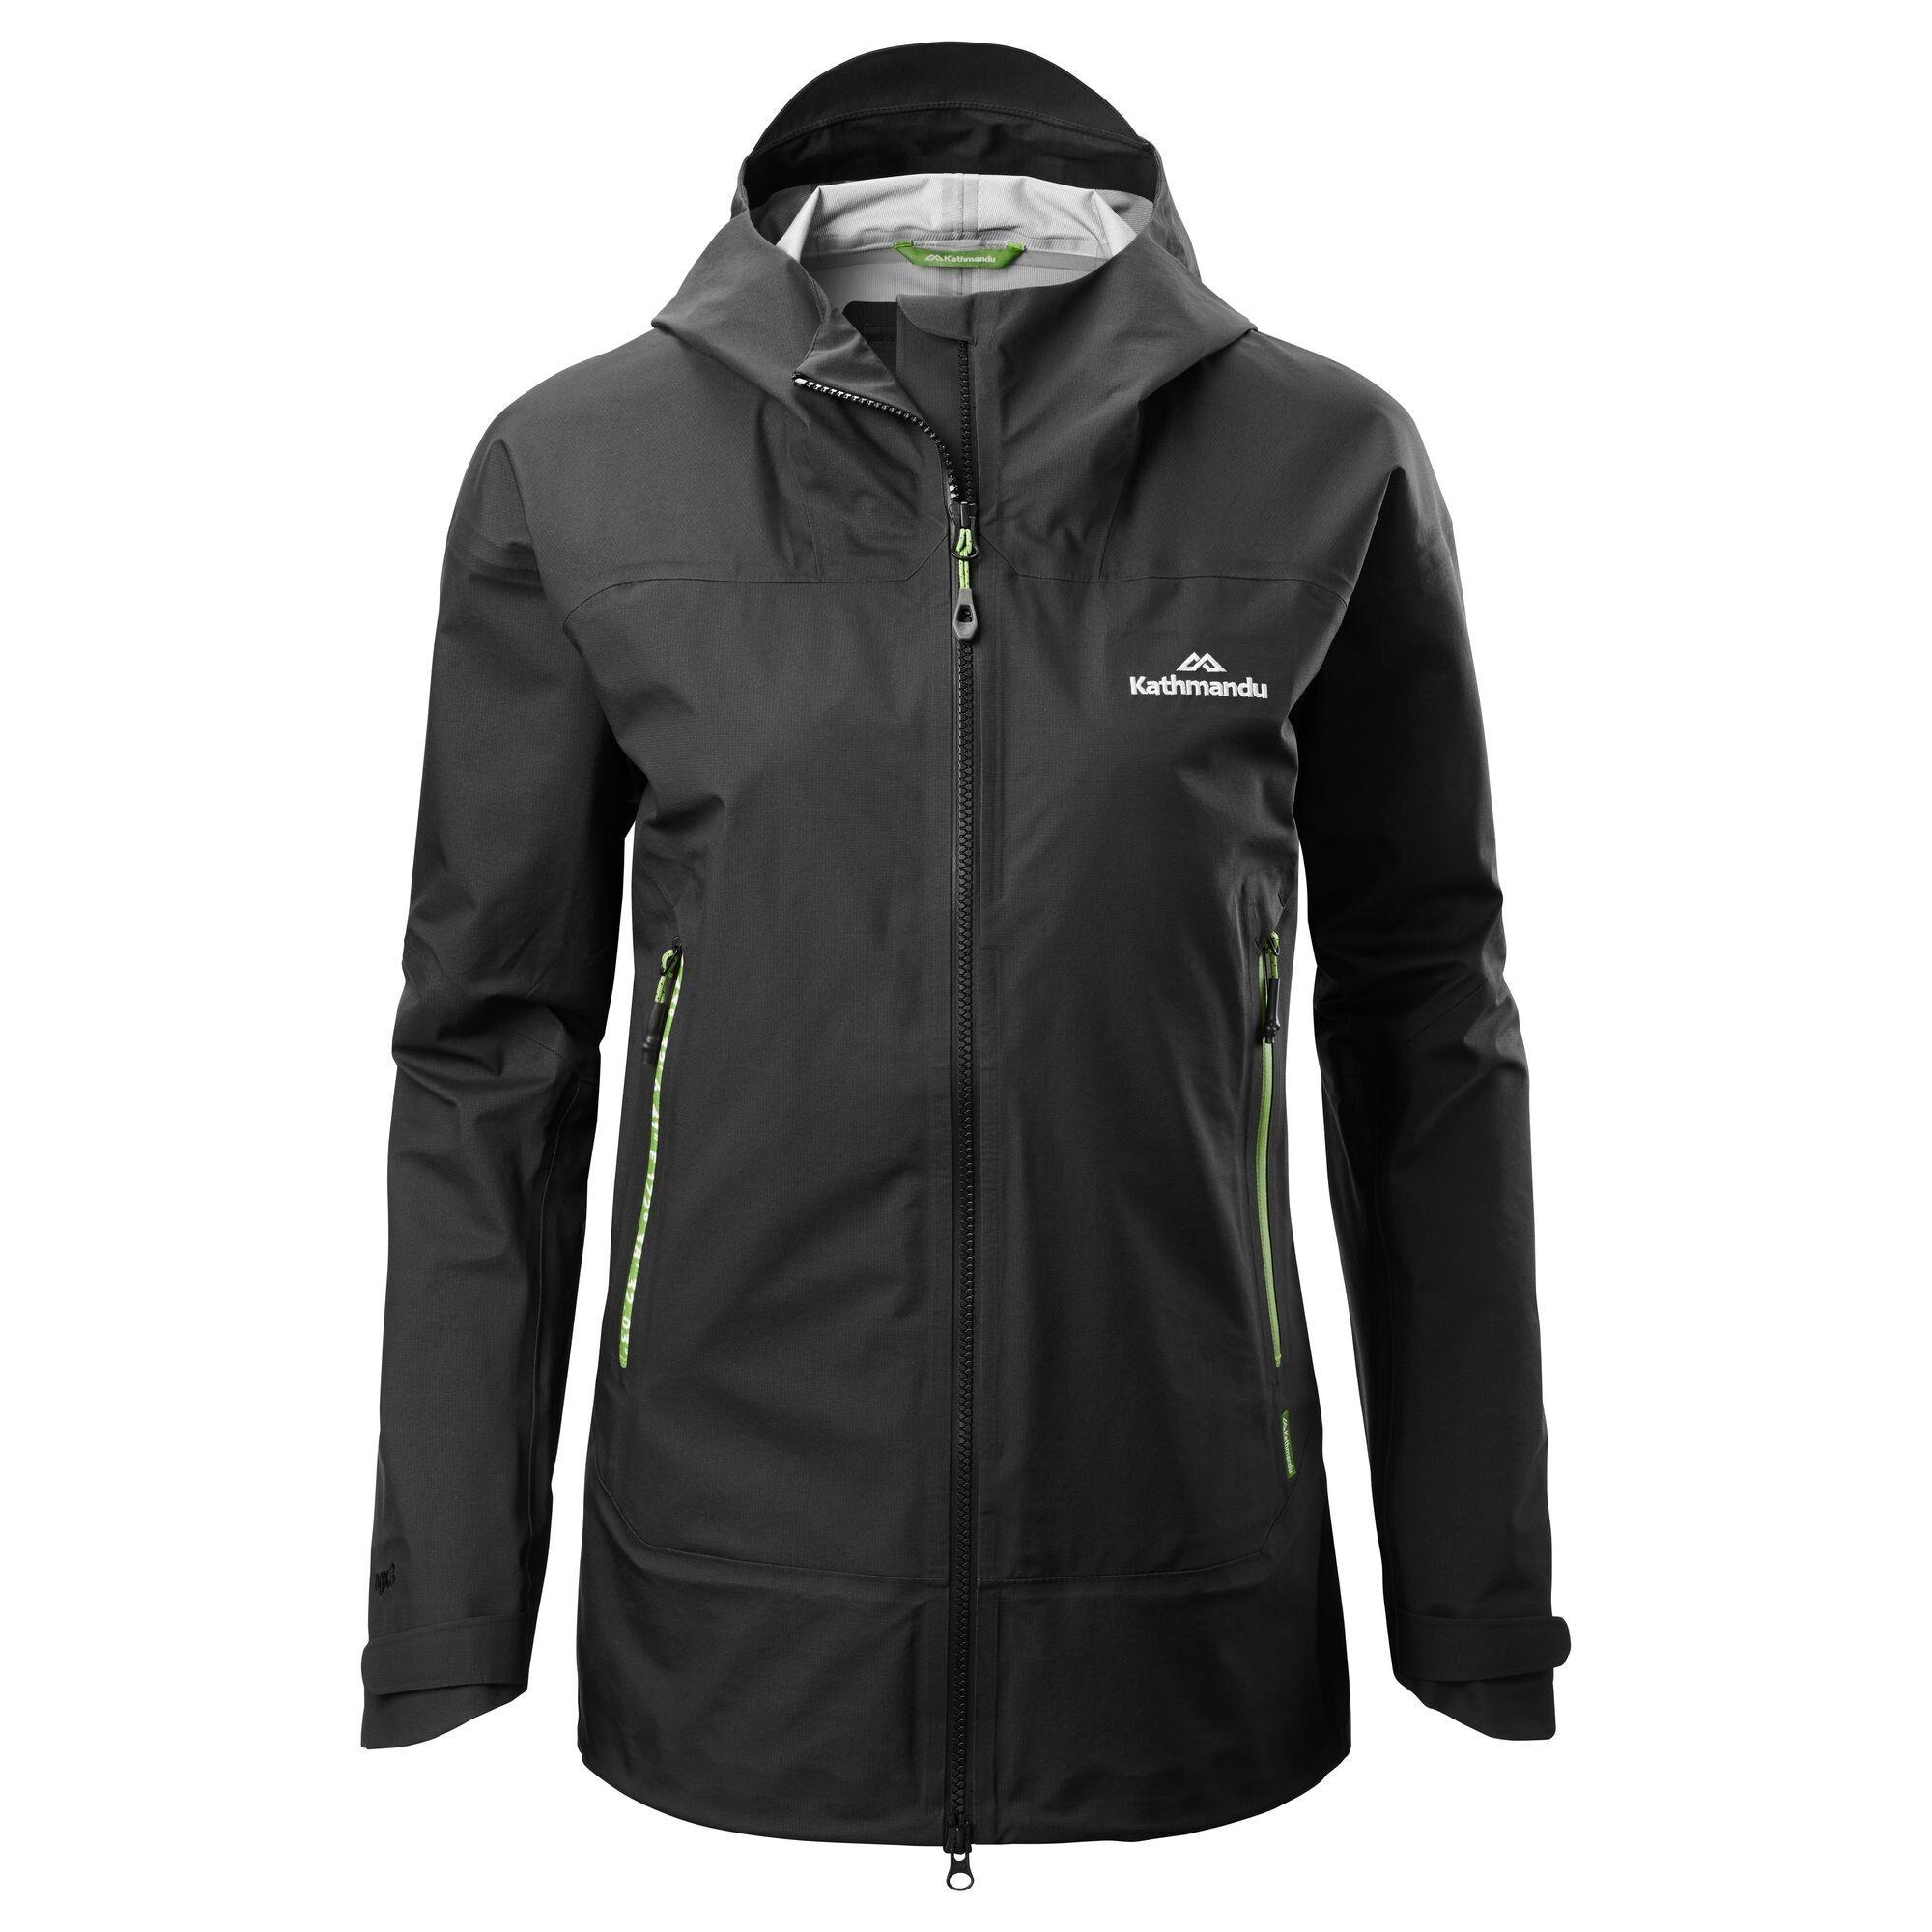 Kathmandu Flinders Women's Rain Jacket  - Black - Size: US 2